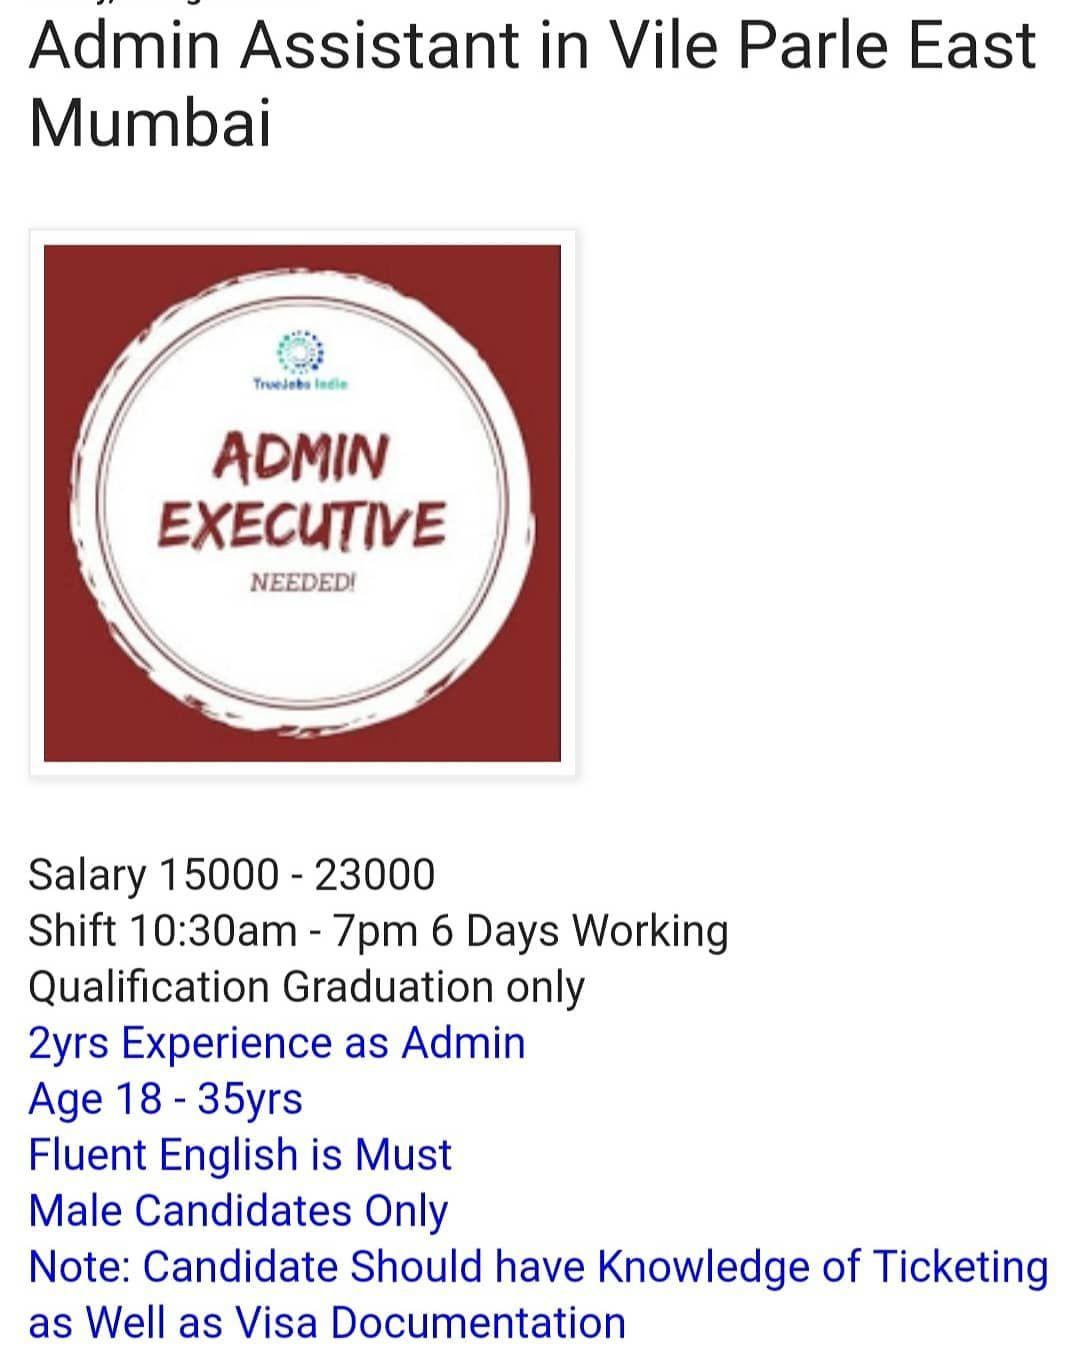 Admin Job In Mumbai In 2020 Admin Jobs Admin Assistant Admin Executive